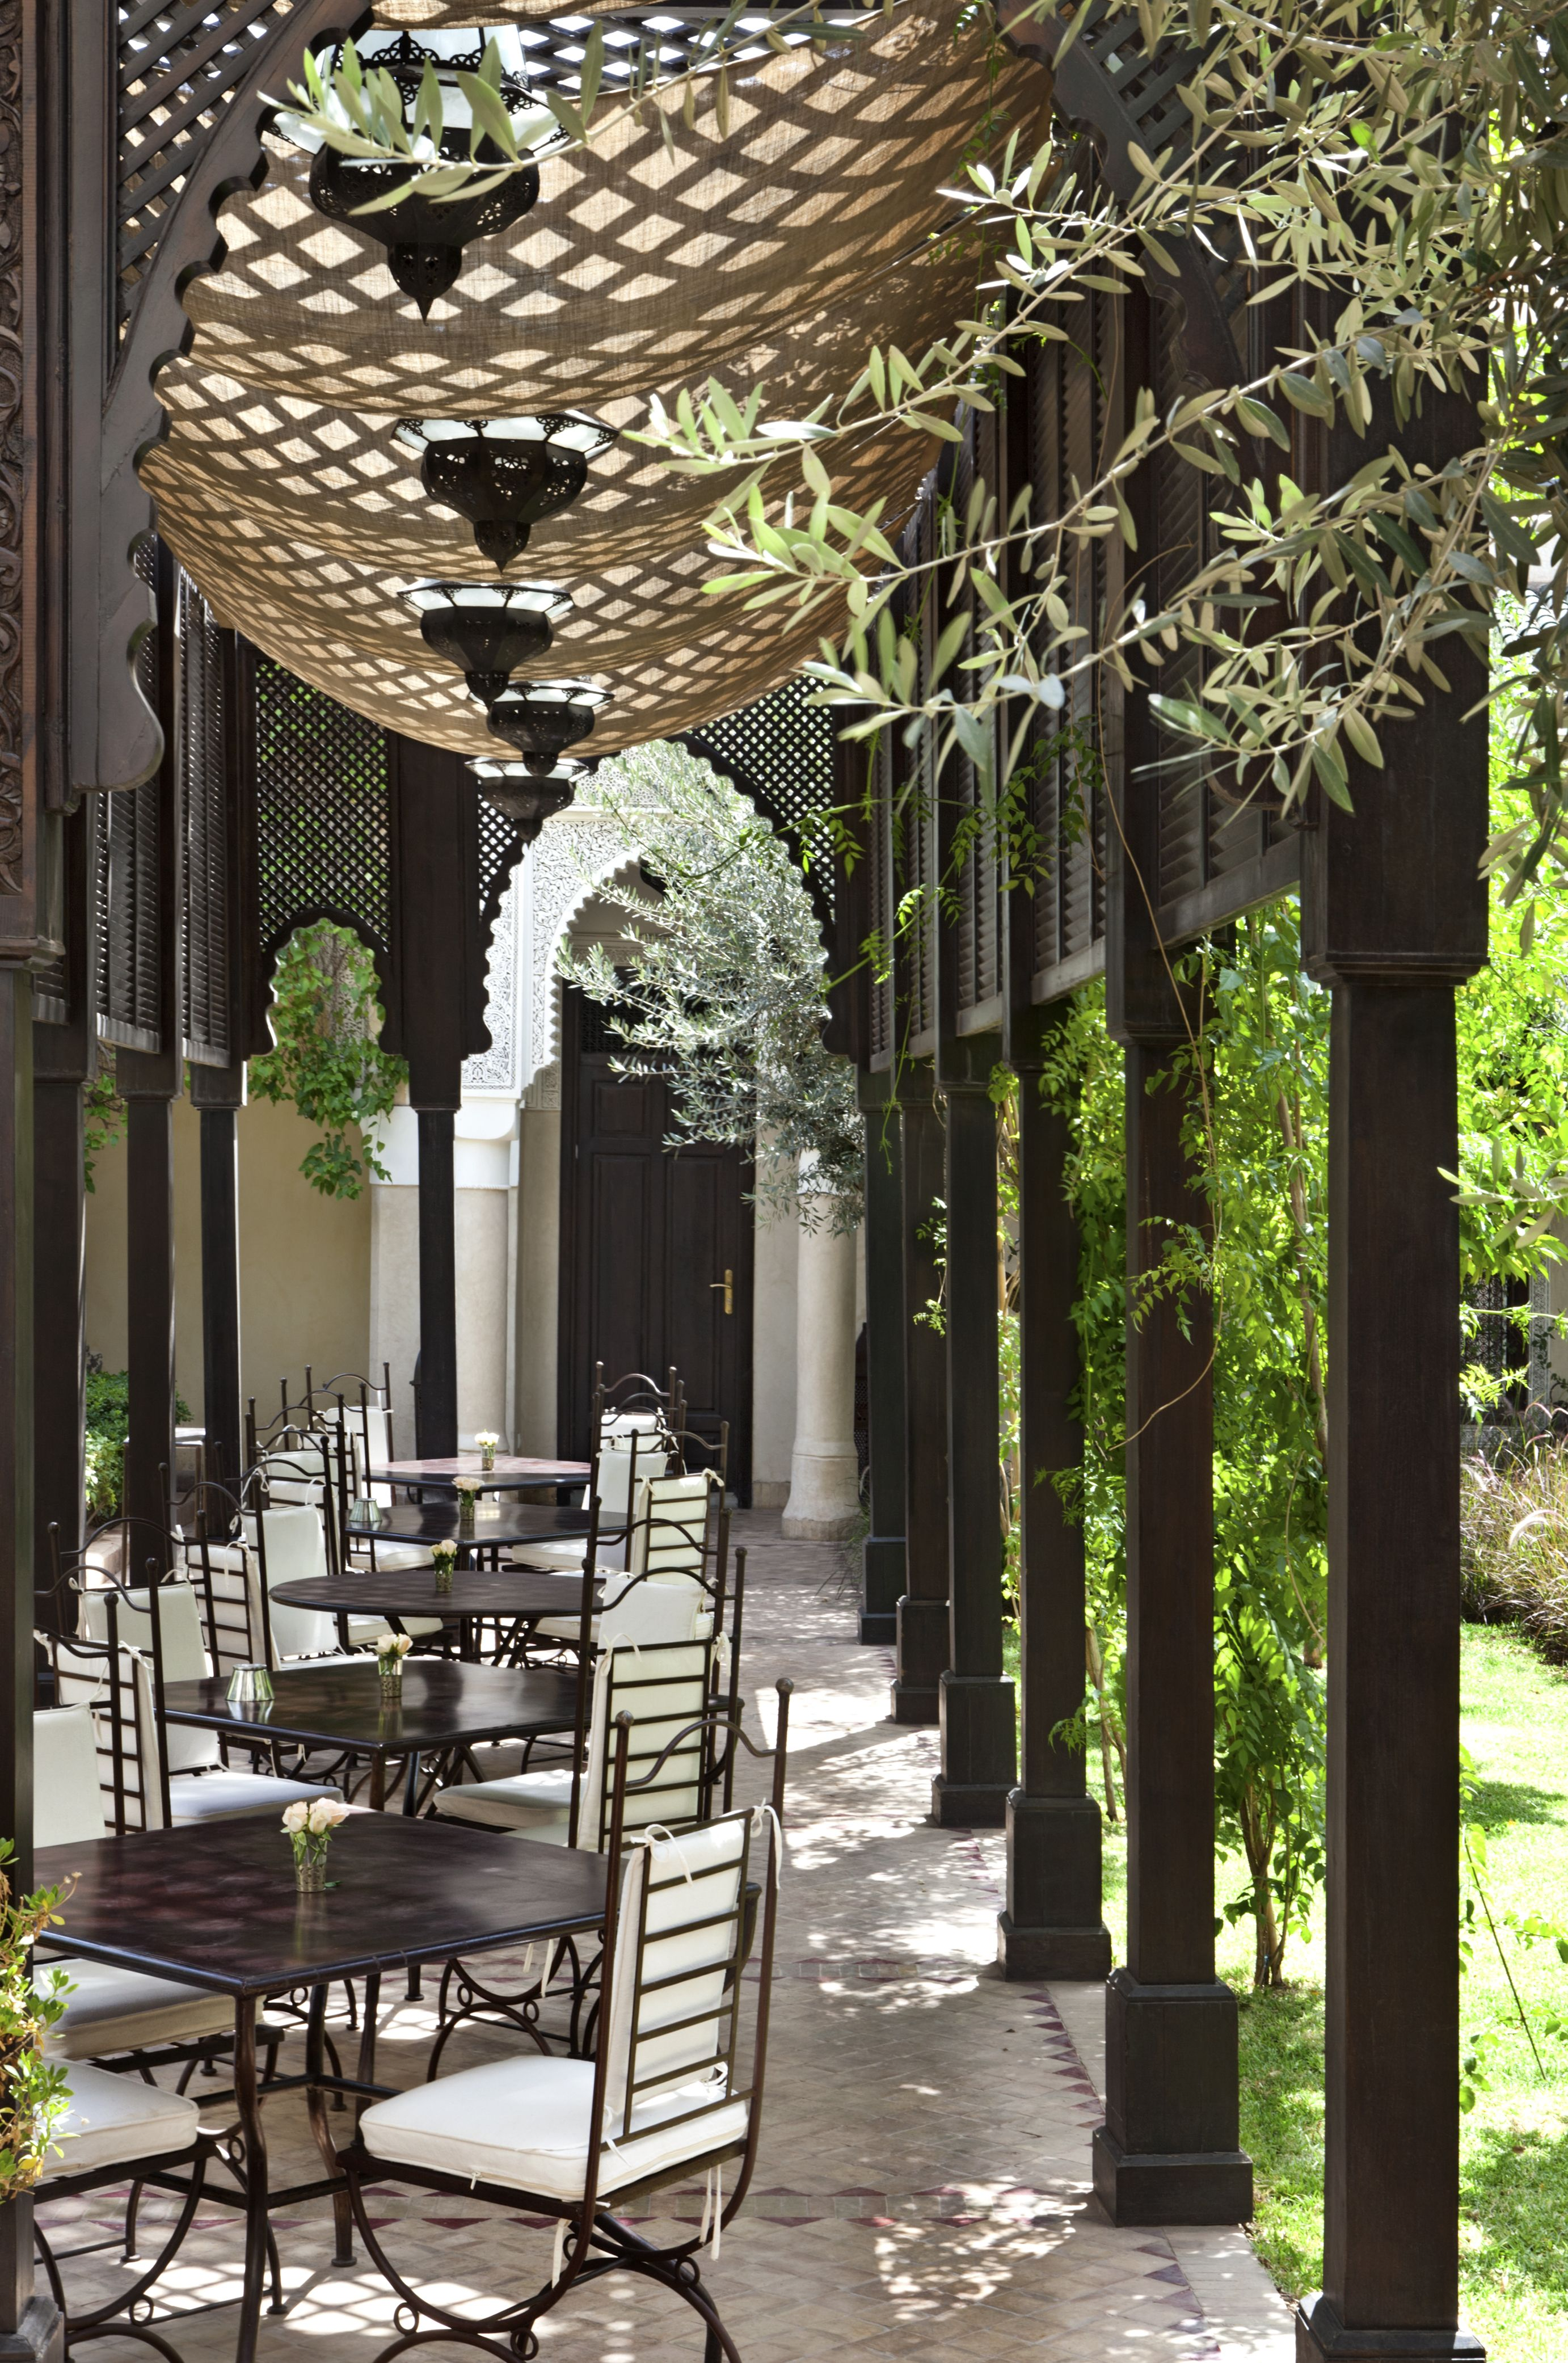 Marrakech Villa Des Orangers Luxury Hotel Design Dream Patio Hotels Design